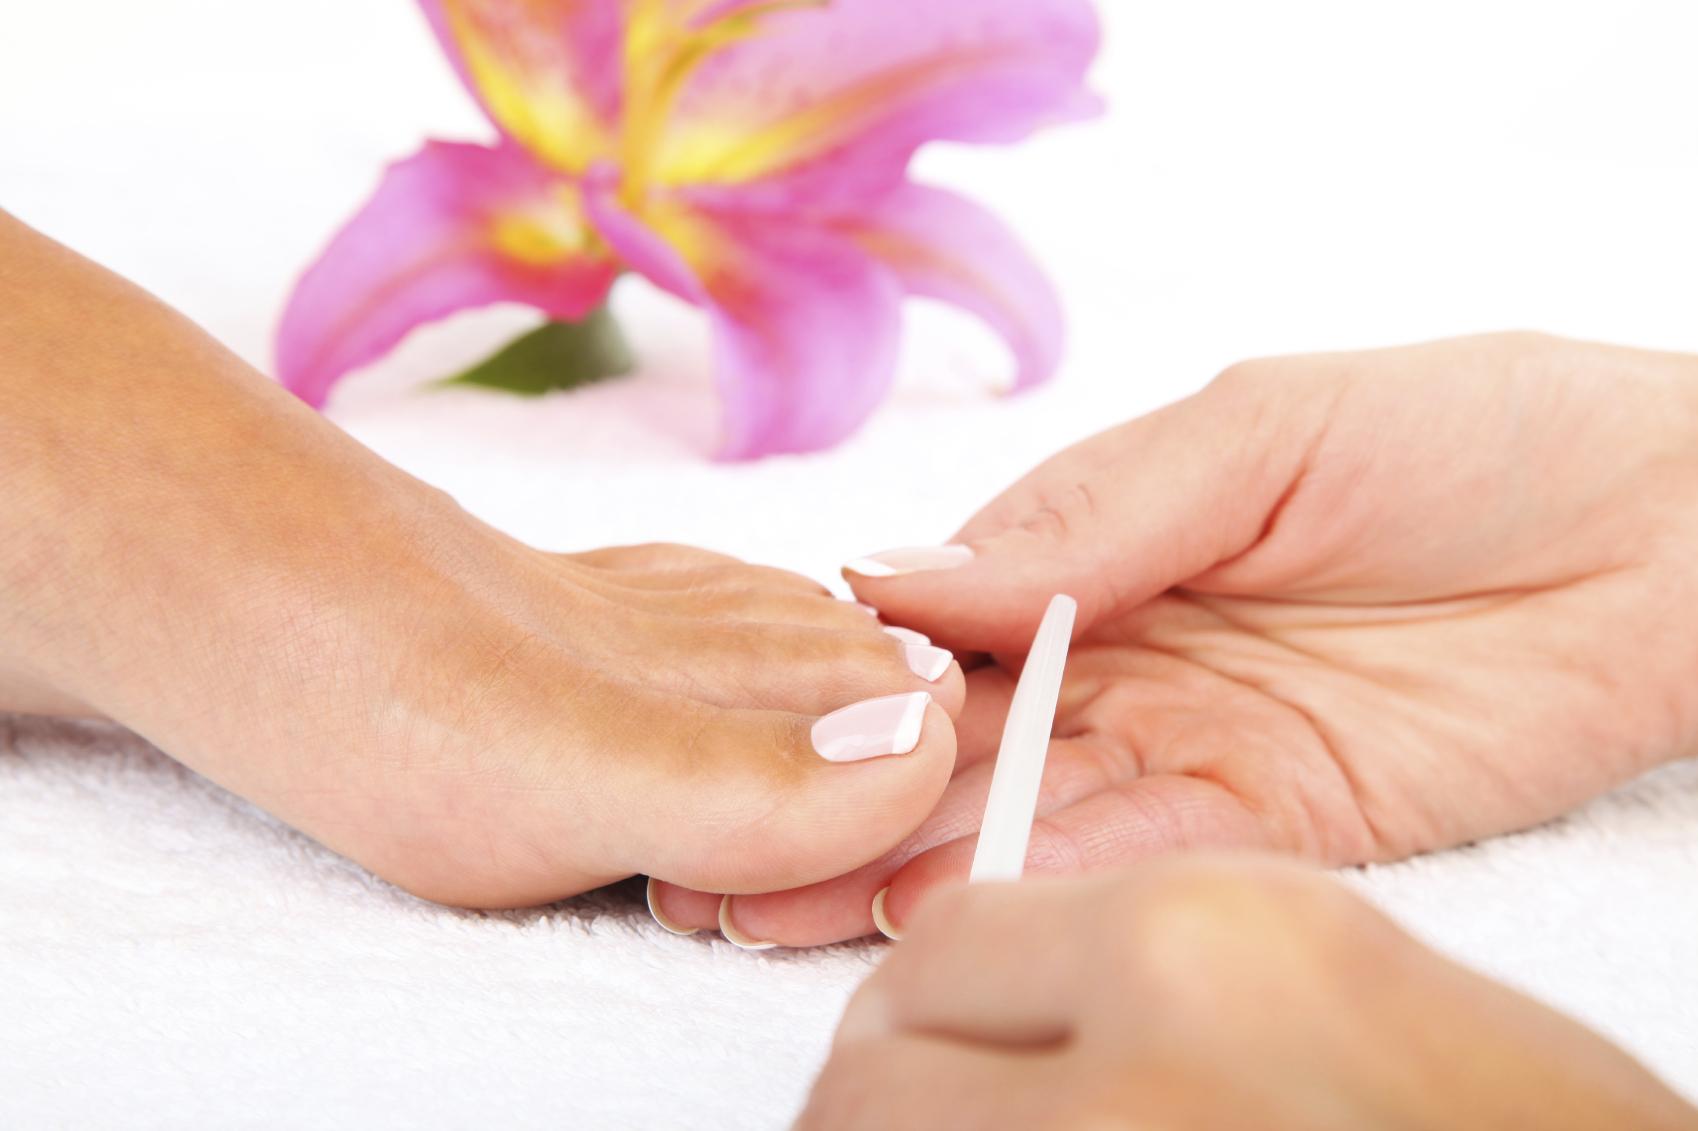 deluxe spa pedicure bay nail spa